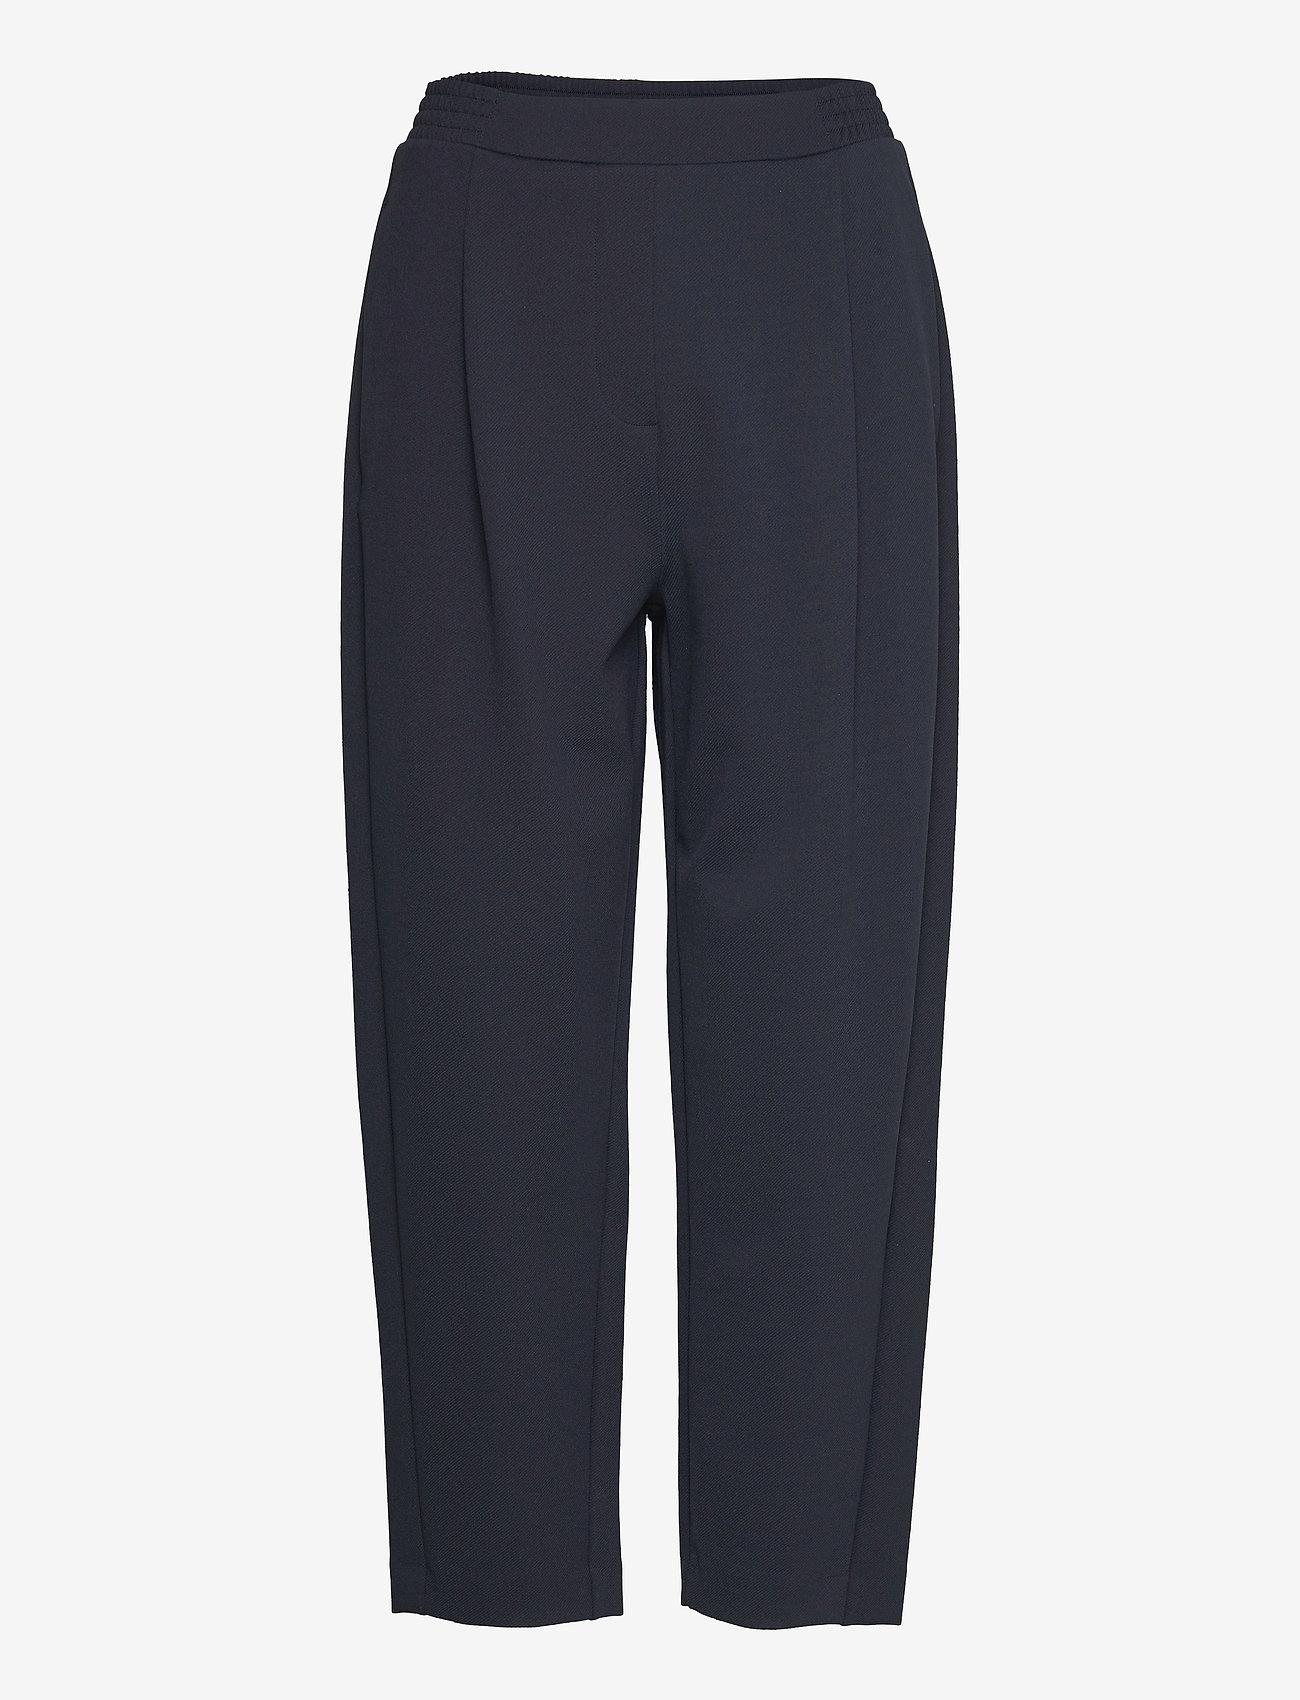 Max Mara Leisure - MILENA - wide leg trousers - navy - 0